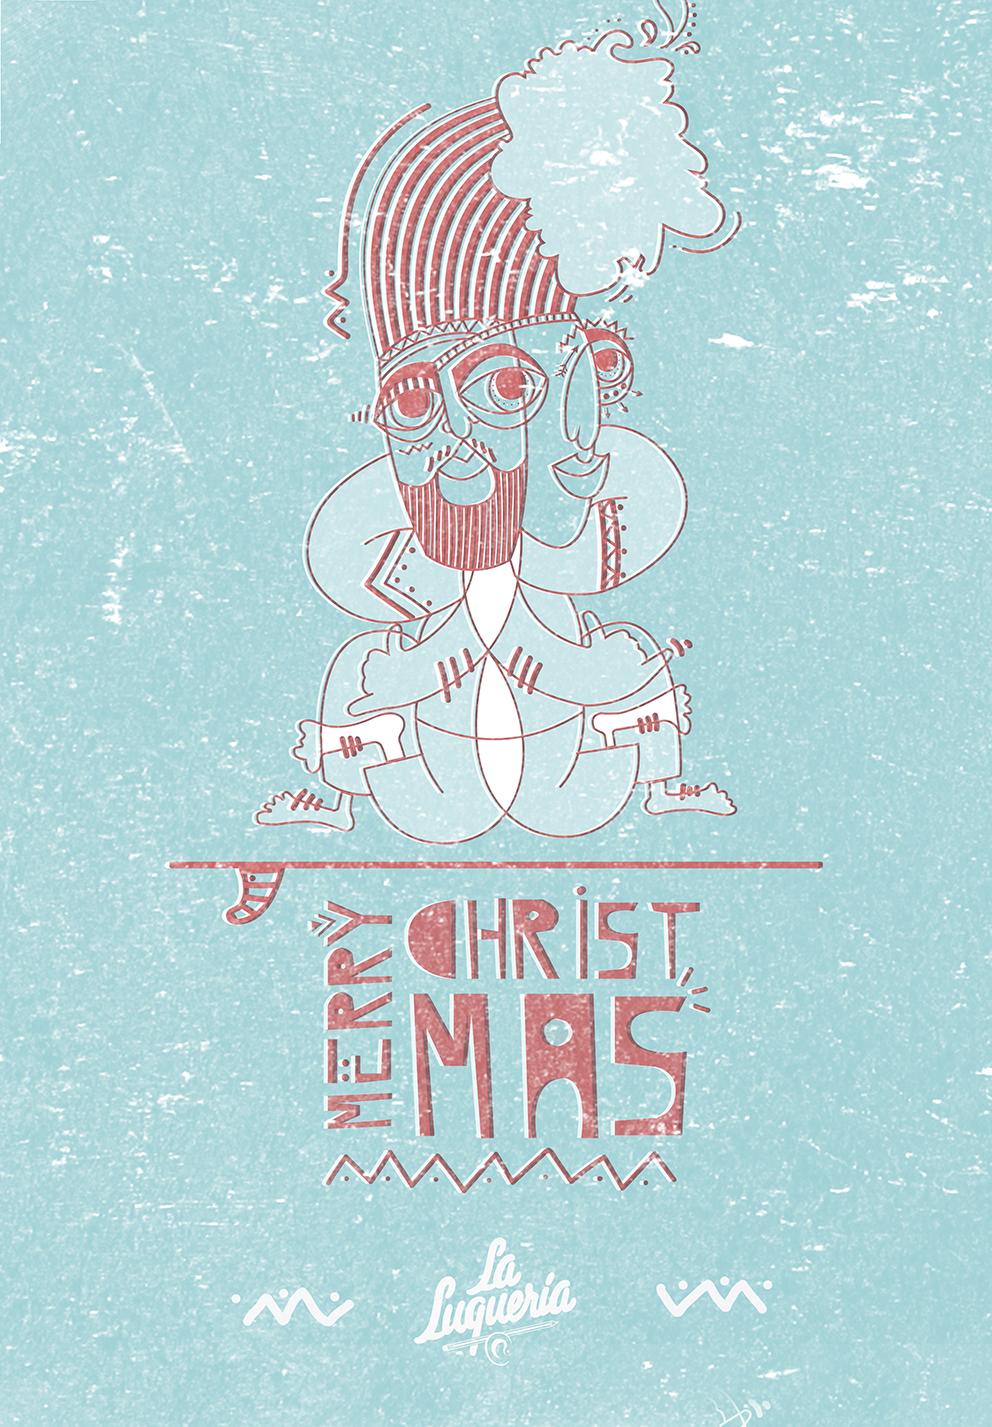 Christmas card - La Luqueria